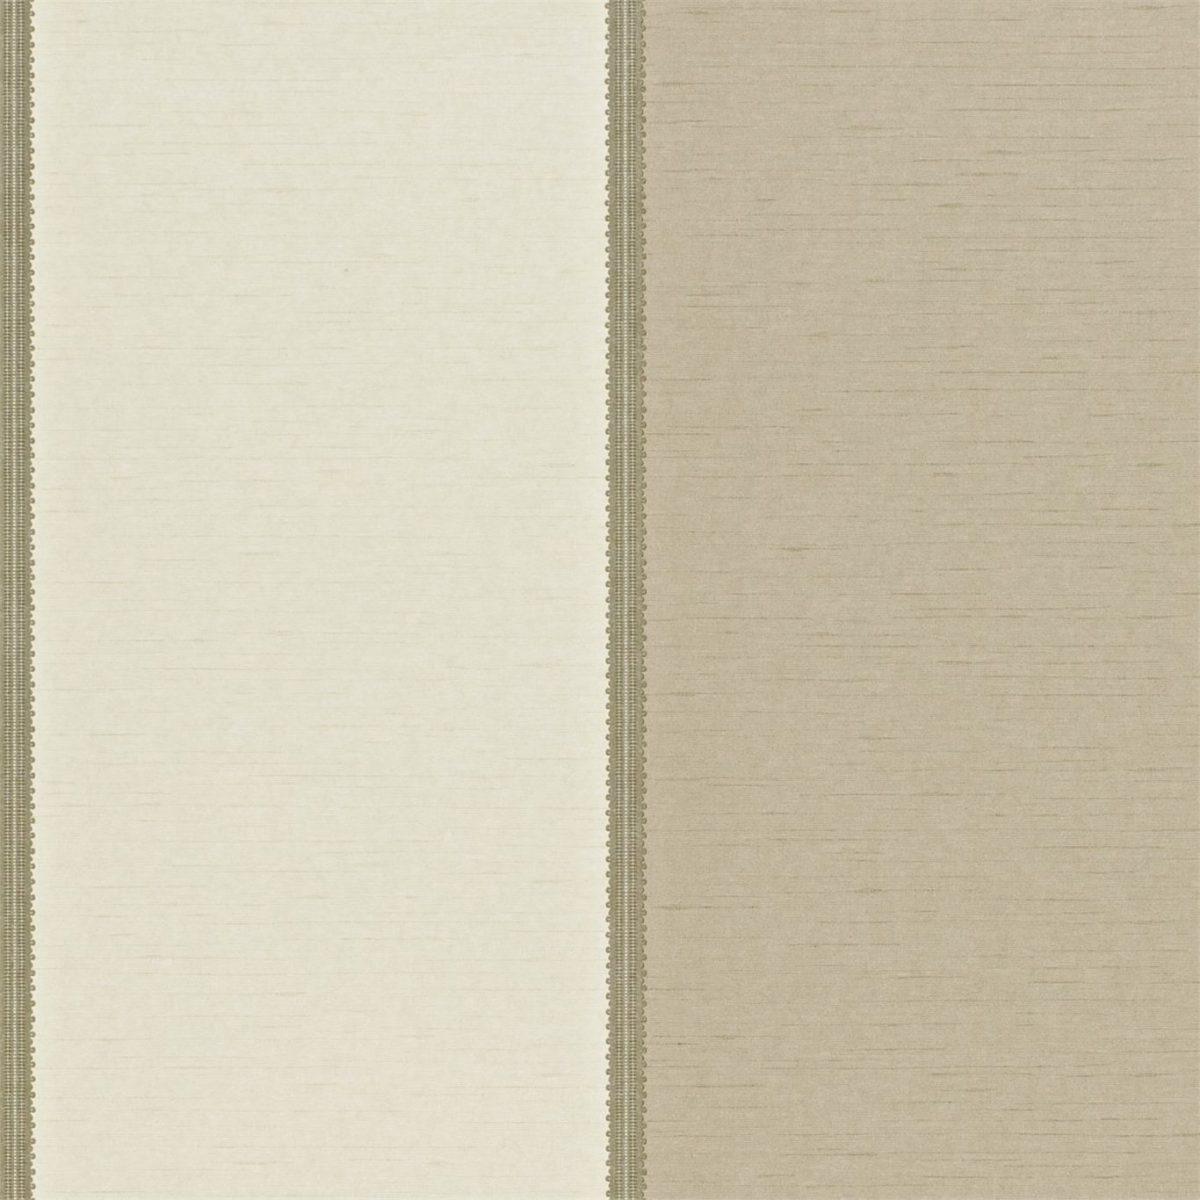 Sanderson Tapet Braided Stripe Ivory / Linen